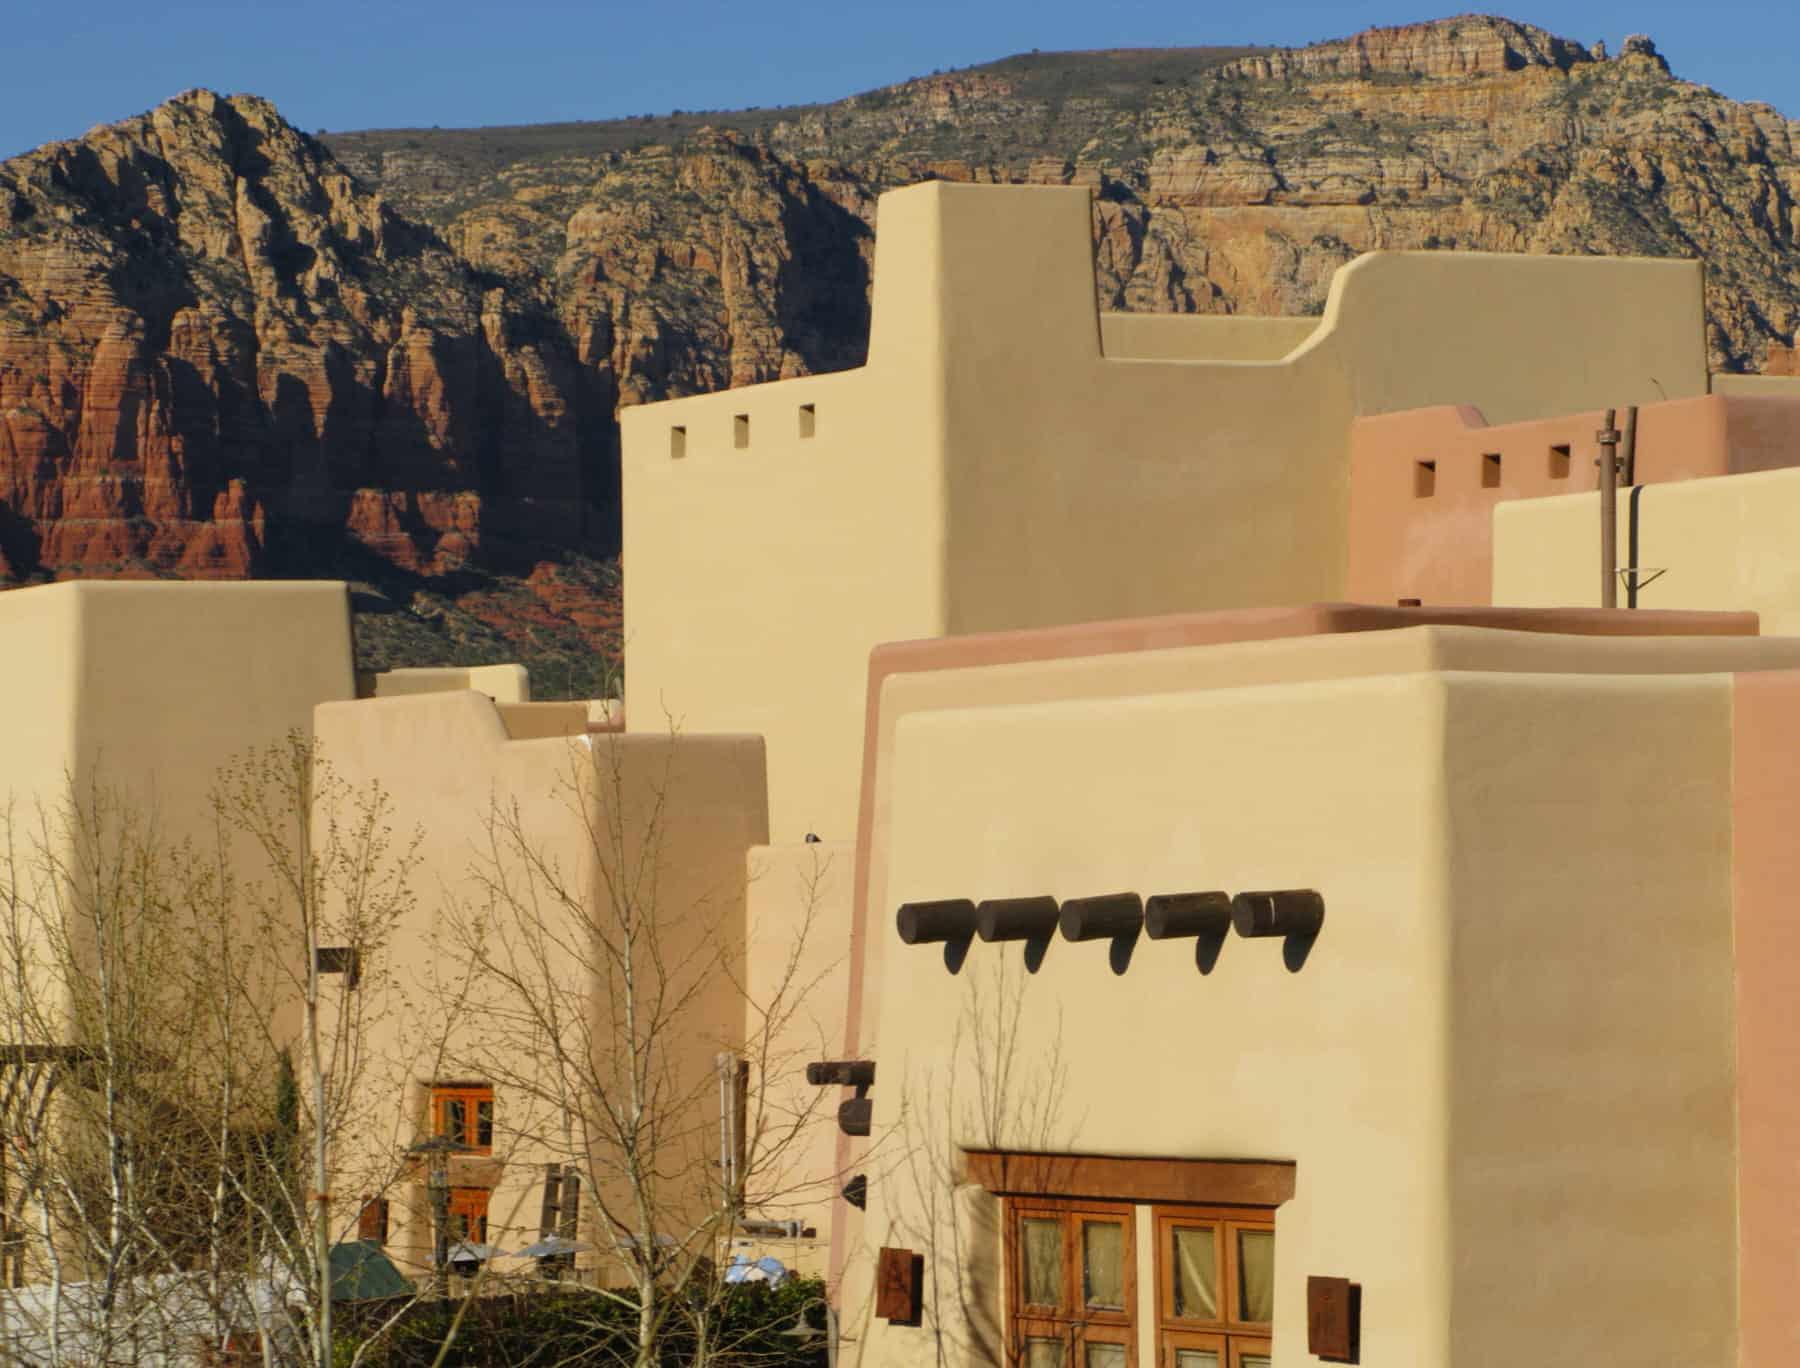 Adobe structure in Sedona Arizona.